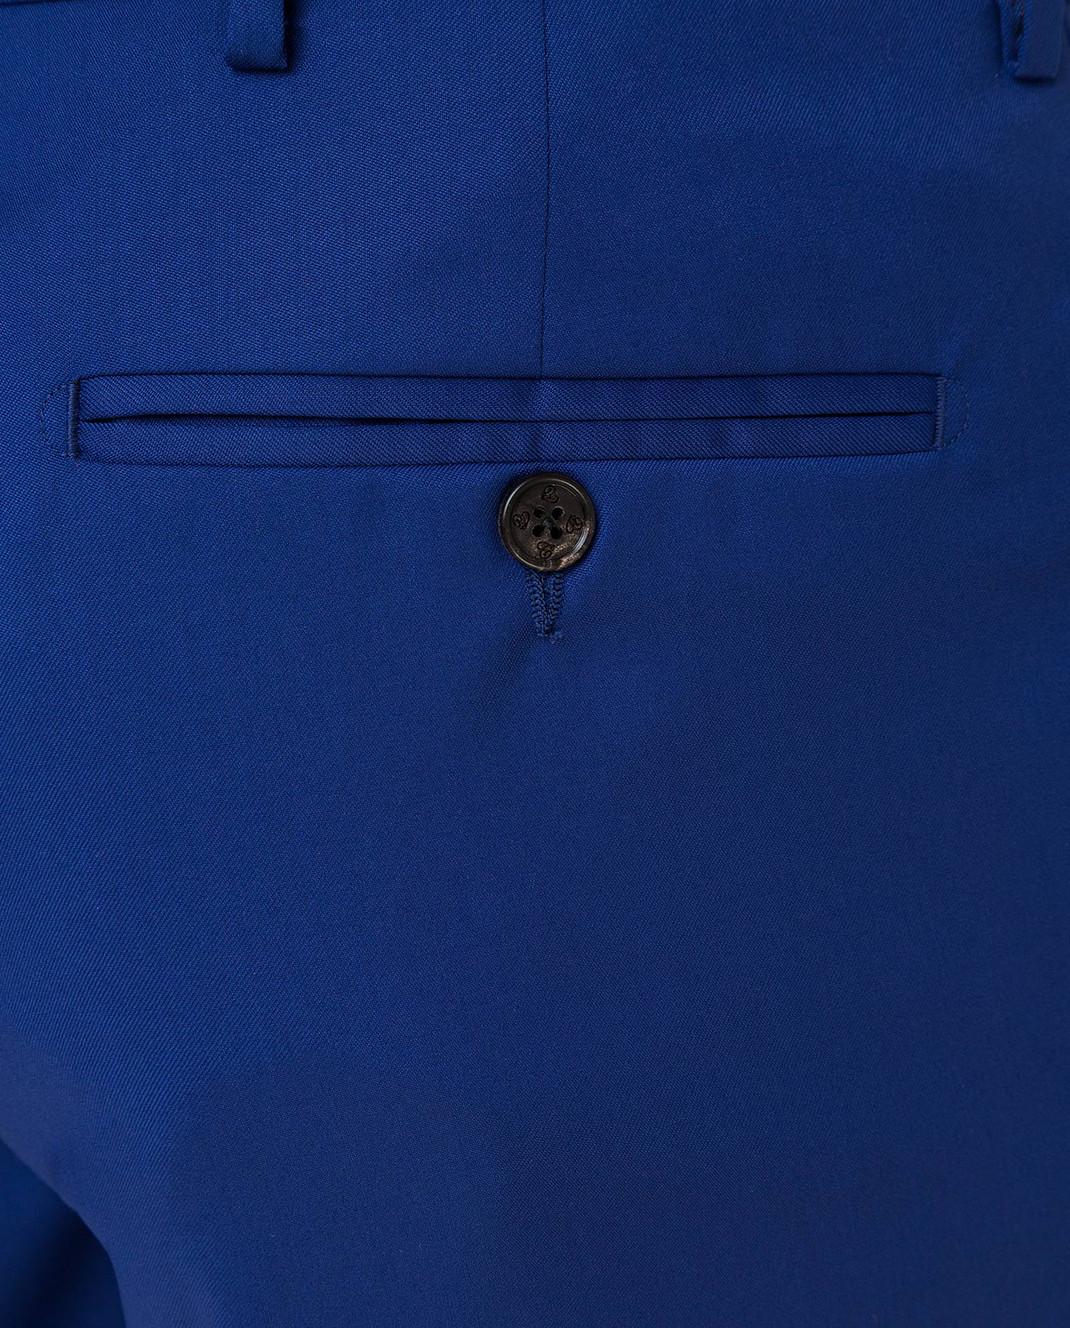 Castello d'Oro Синие брюки из шерсти изображение 5